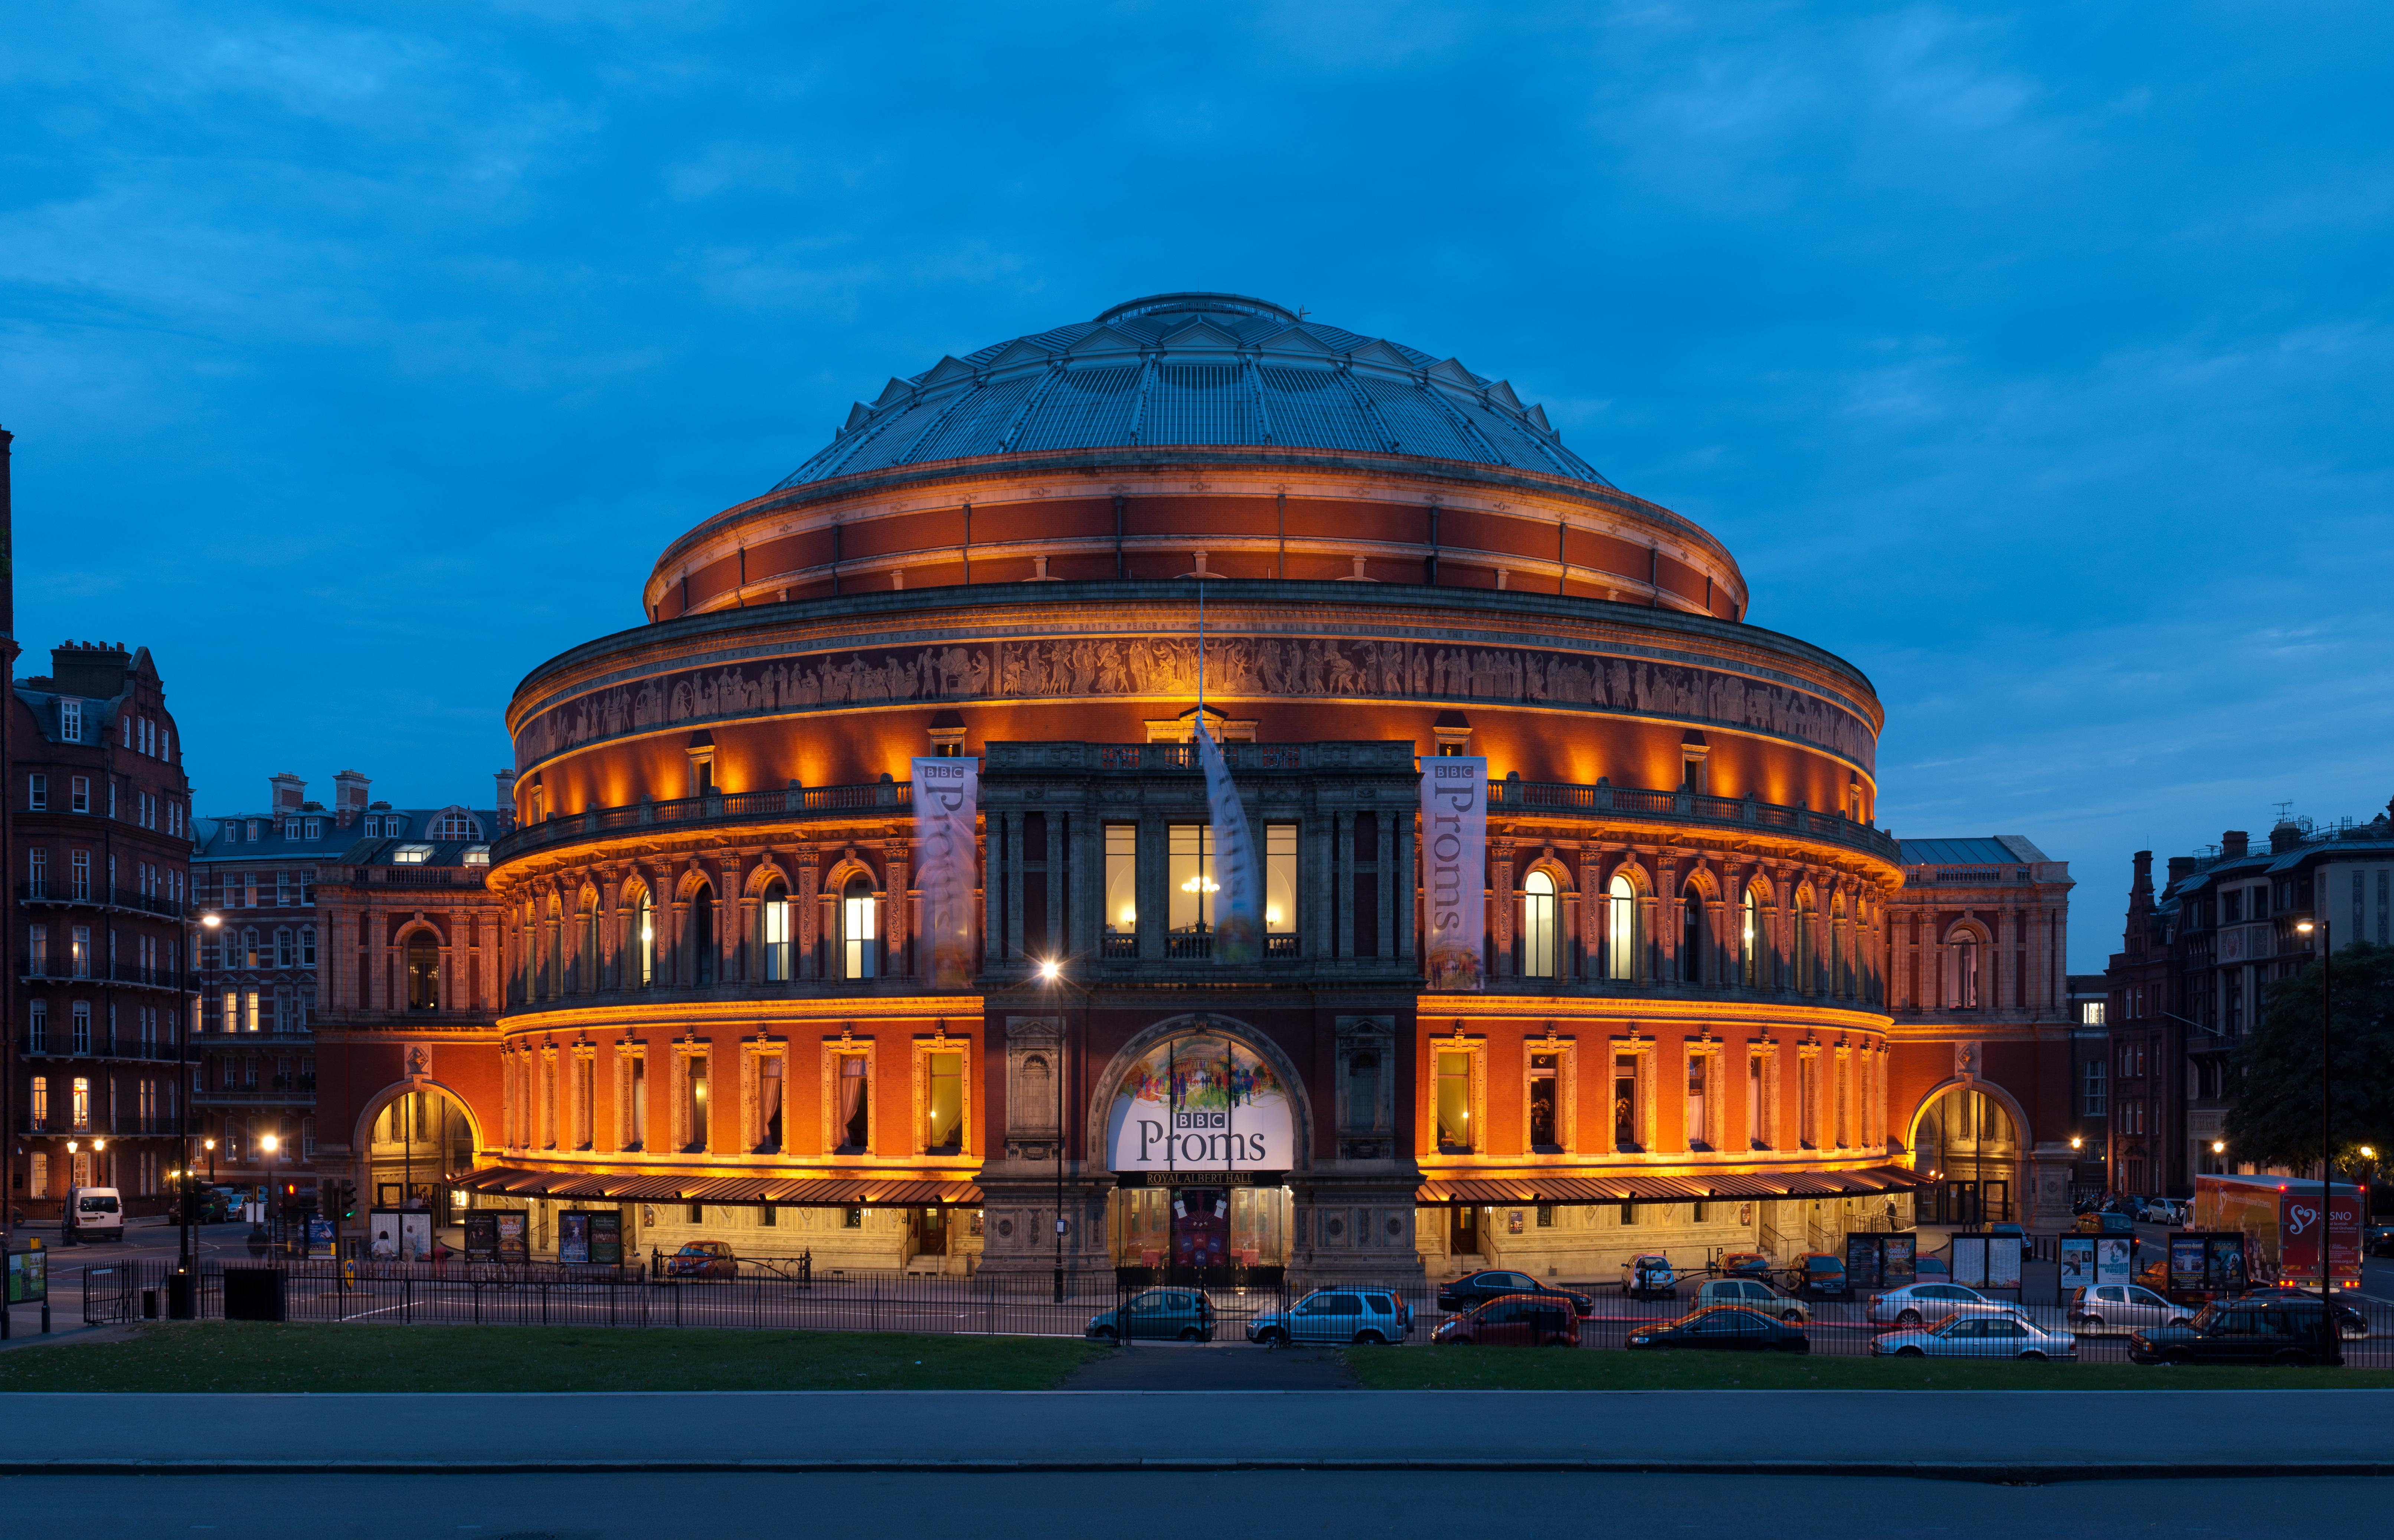 File:Royal Albert Hall, London.jpg - Wikipedia, the free encyclopedia